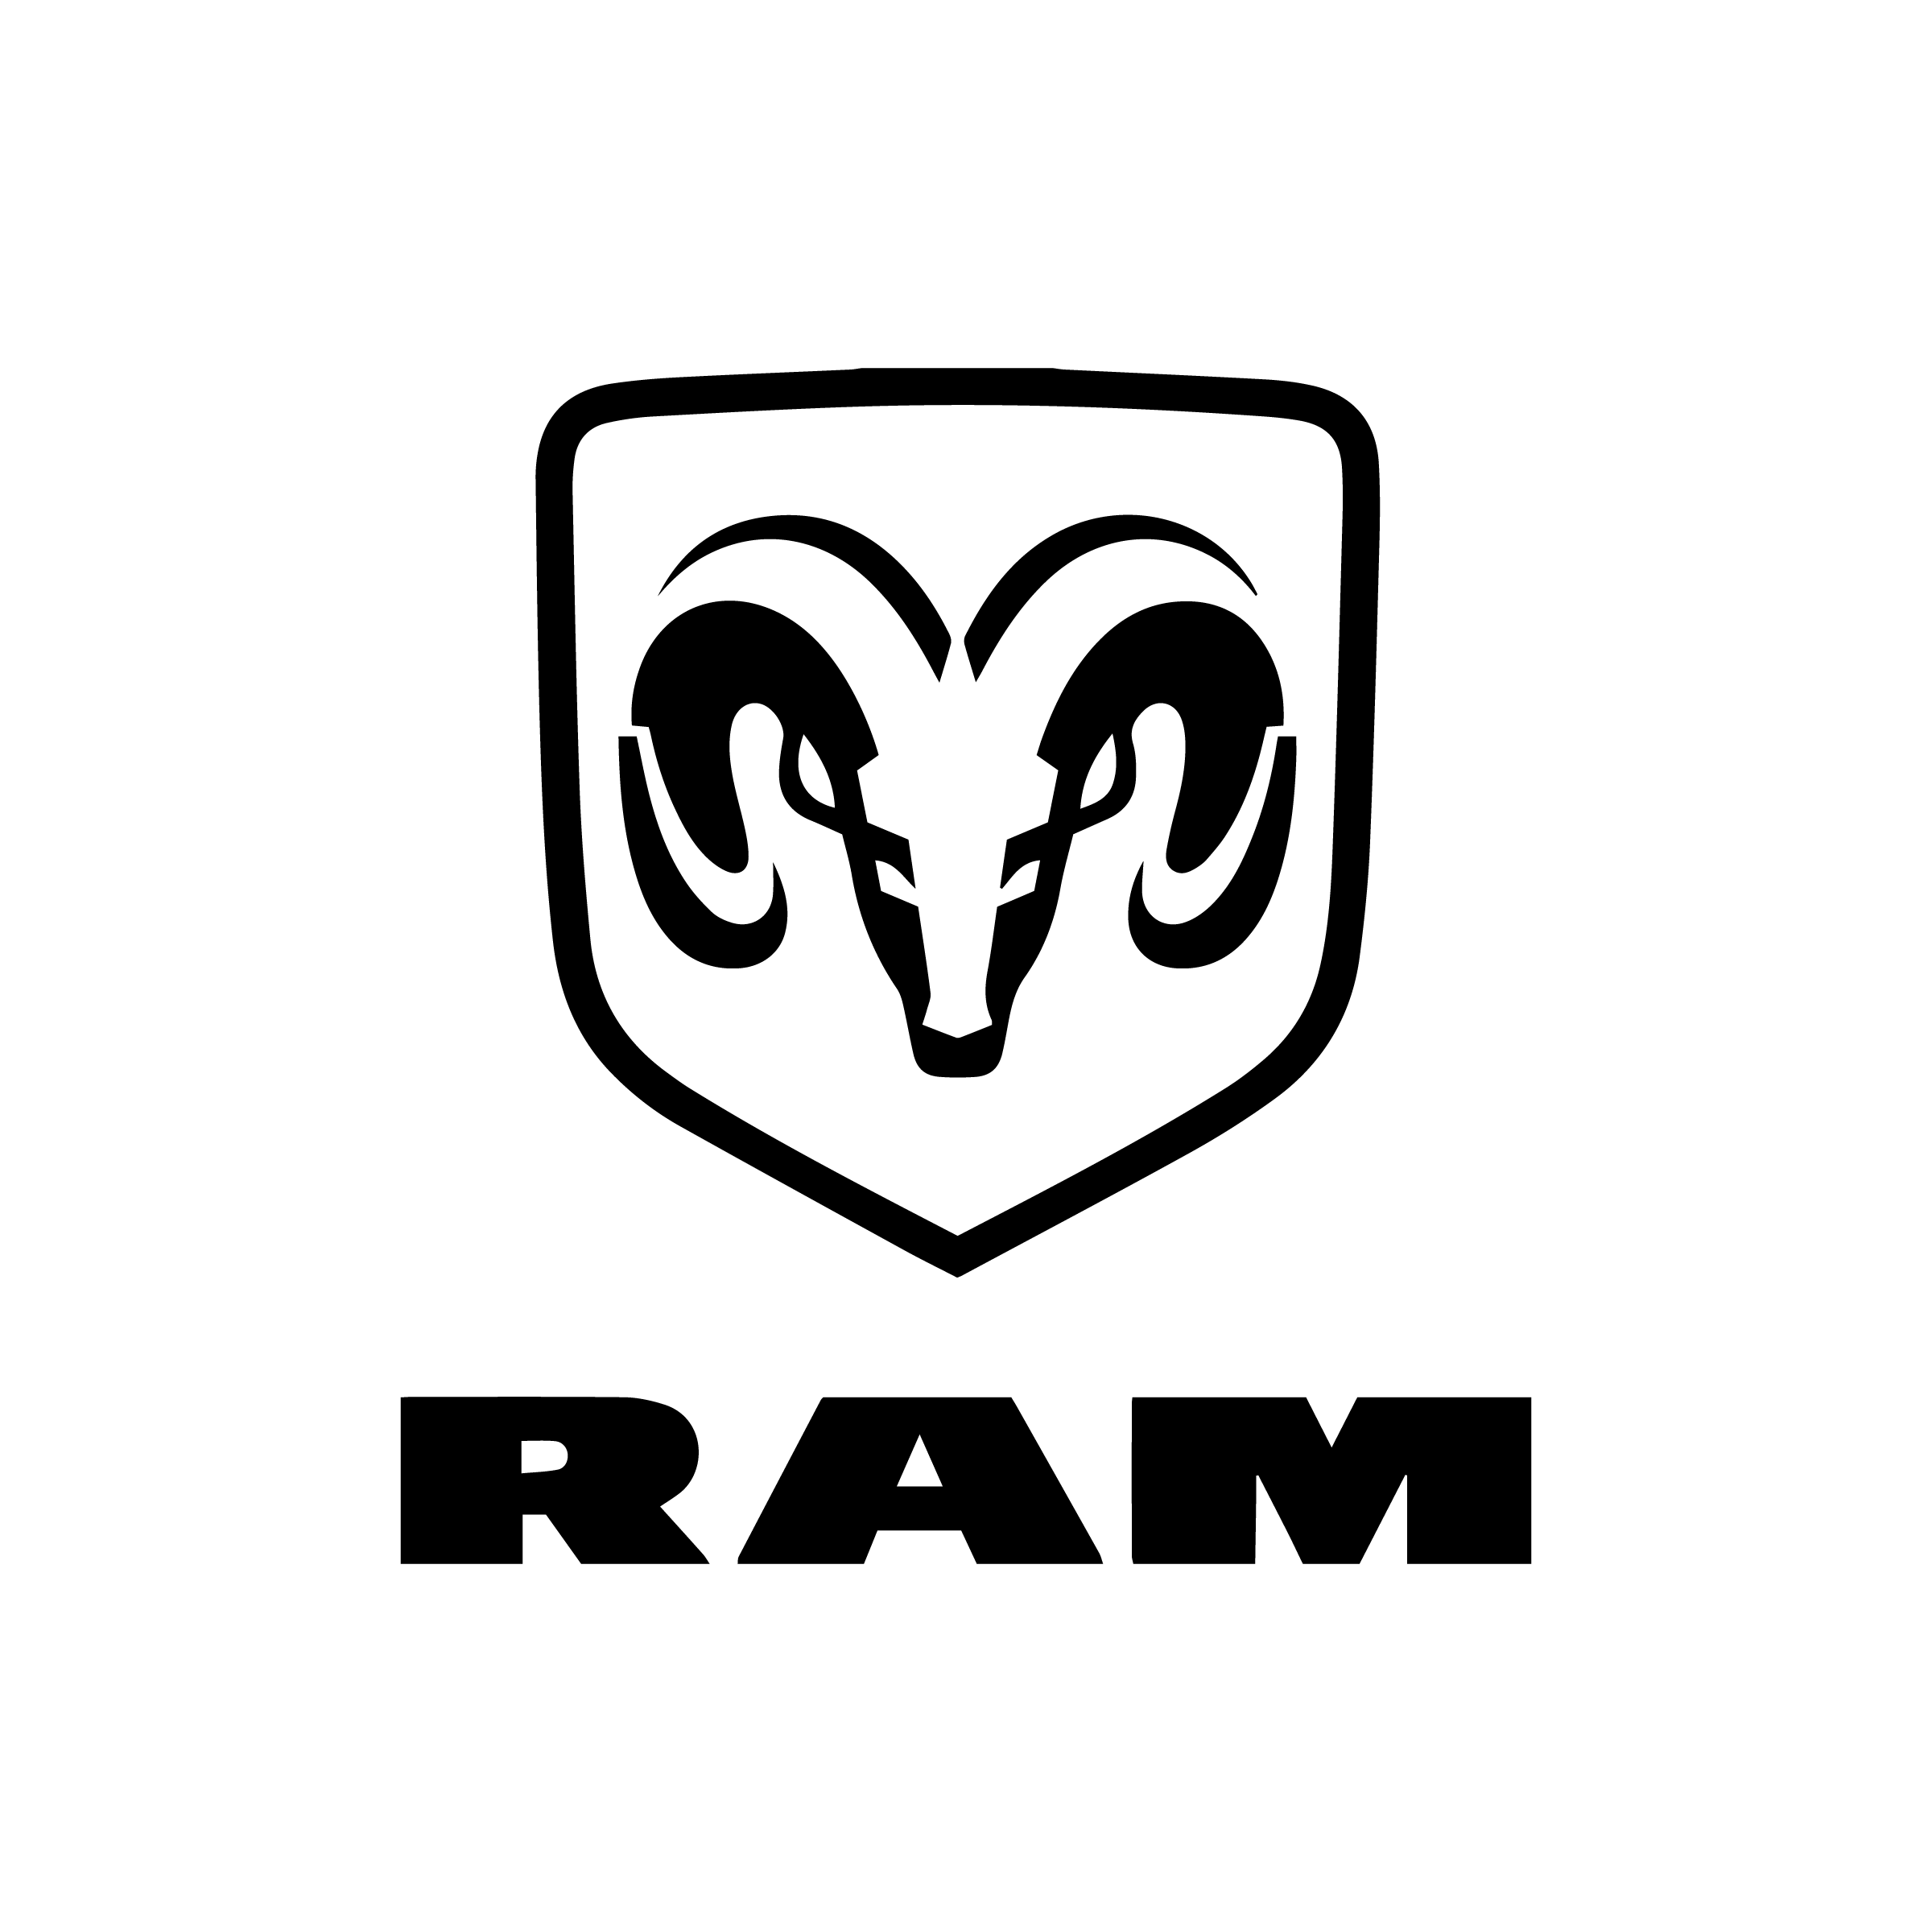 ram-01.png